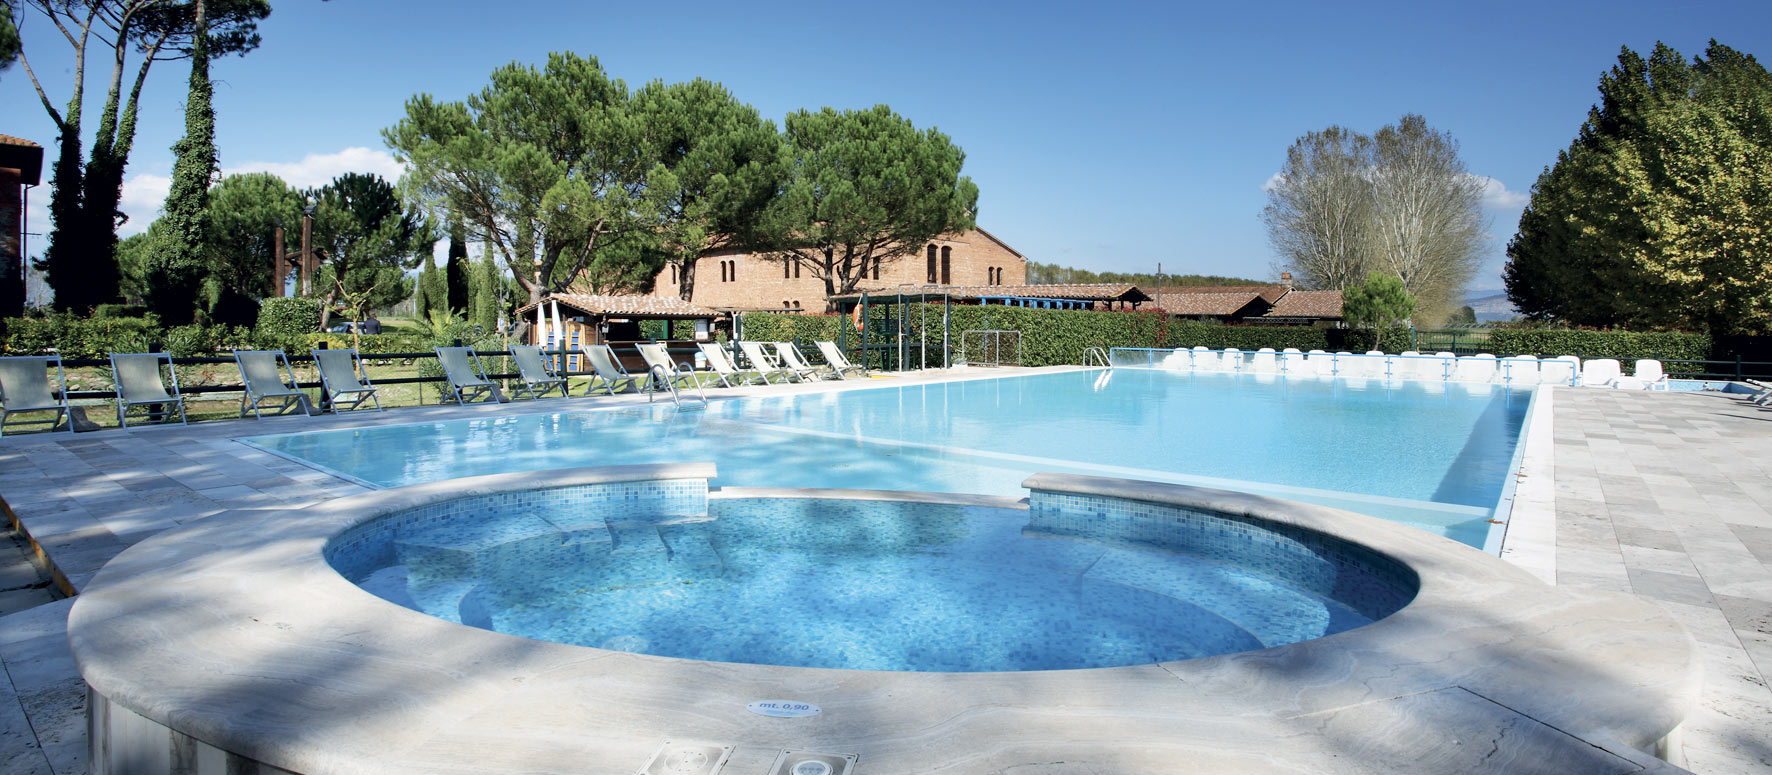 Fattoria settepassi rp hotels - Piscina san giuliano milanese ...